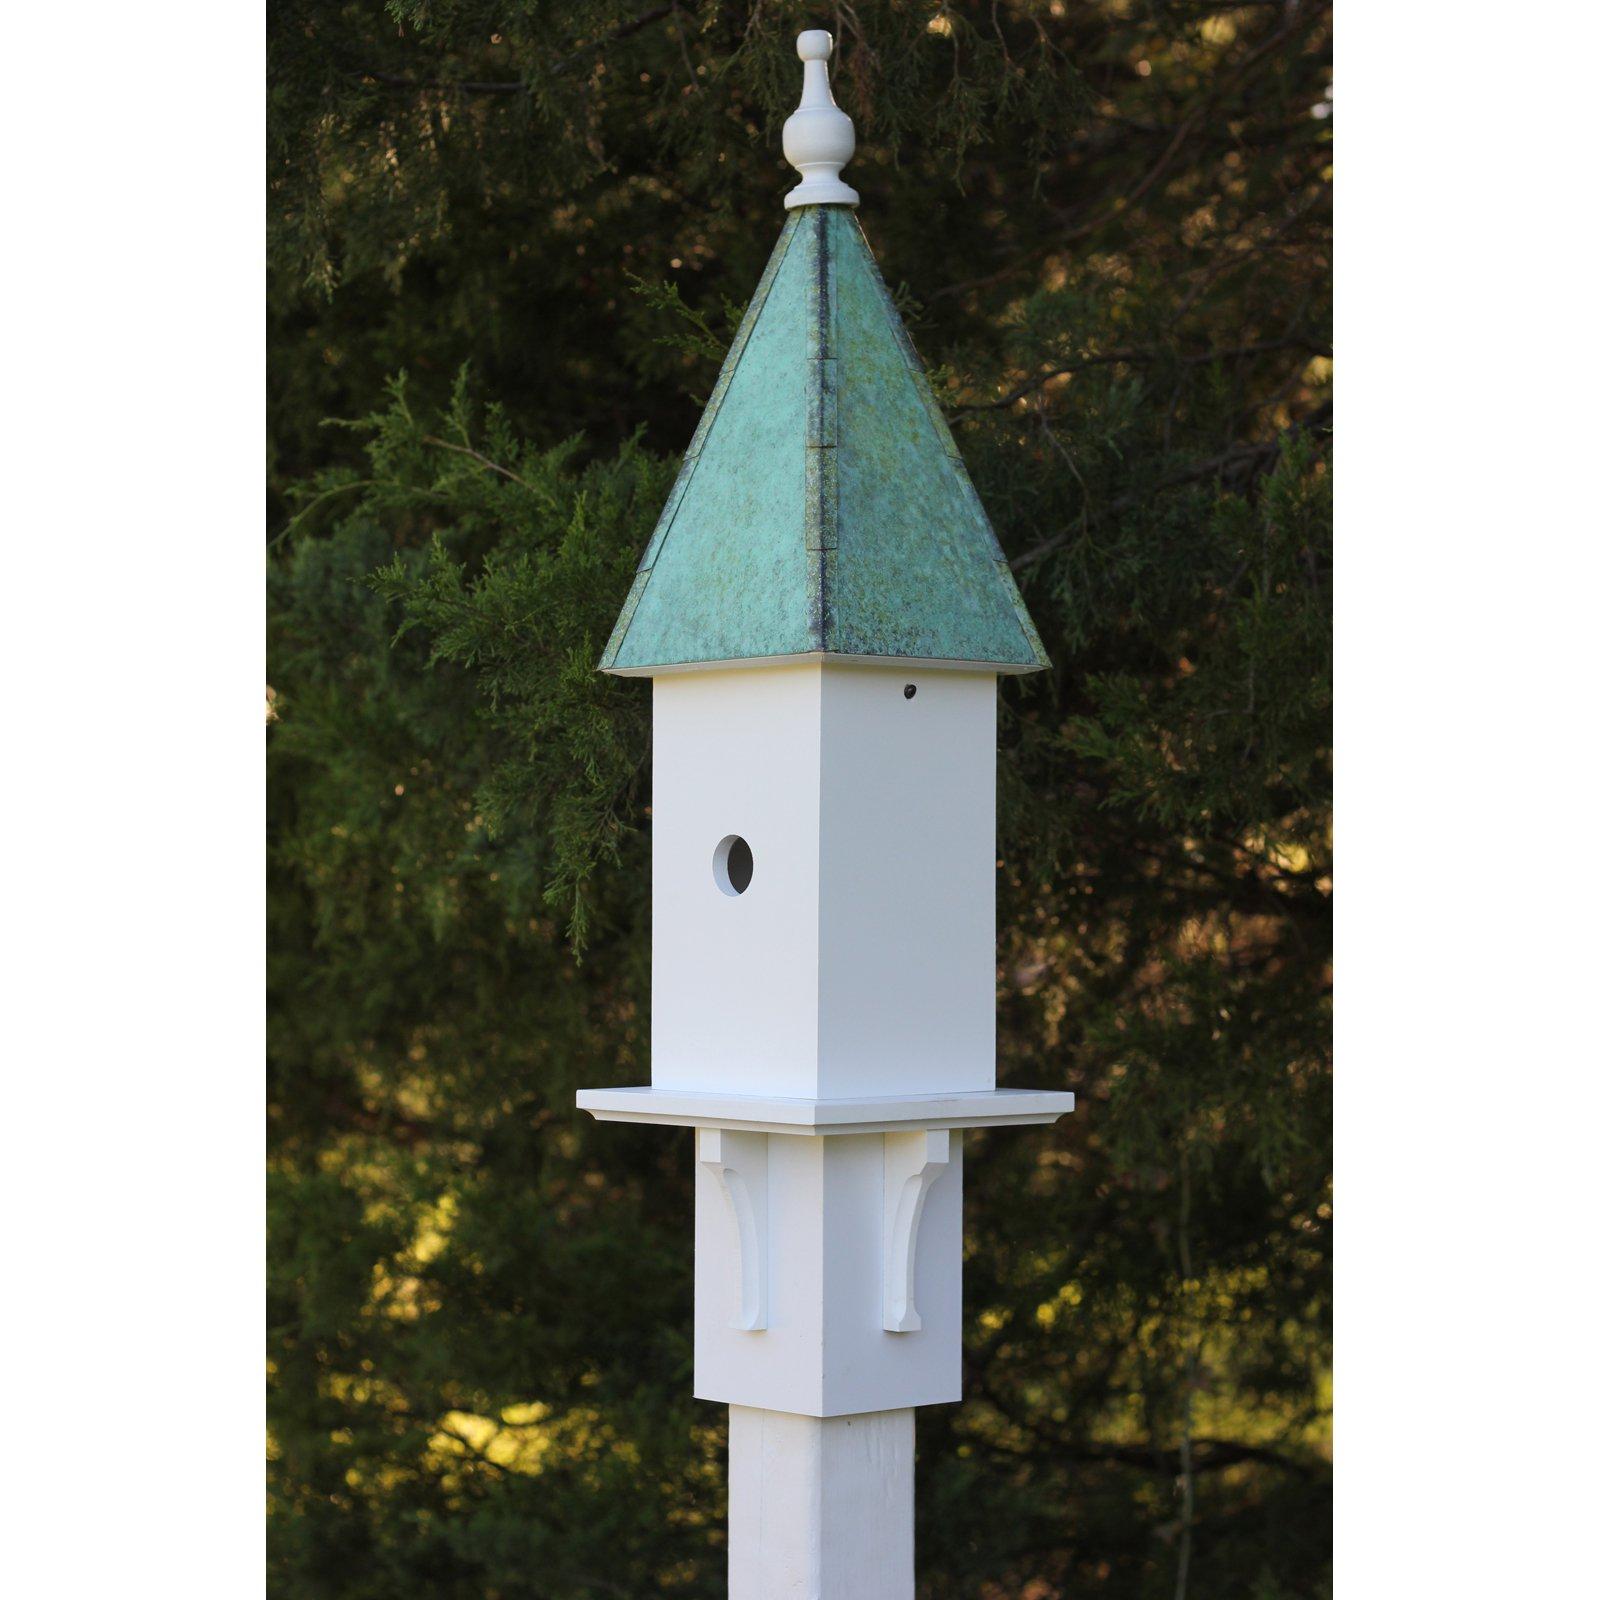 Heartwood Songbird Station Bird House